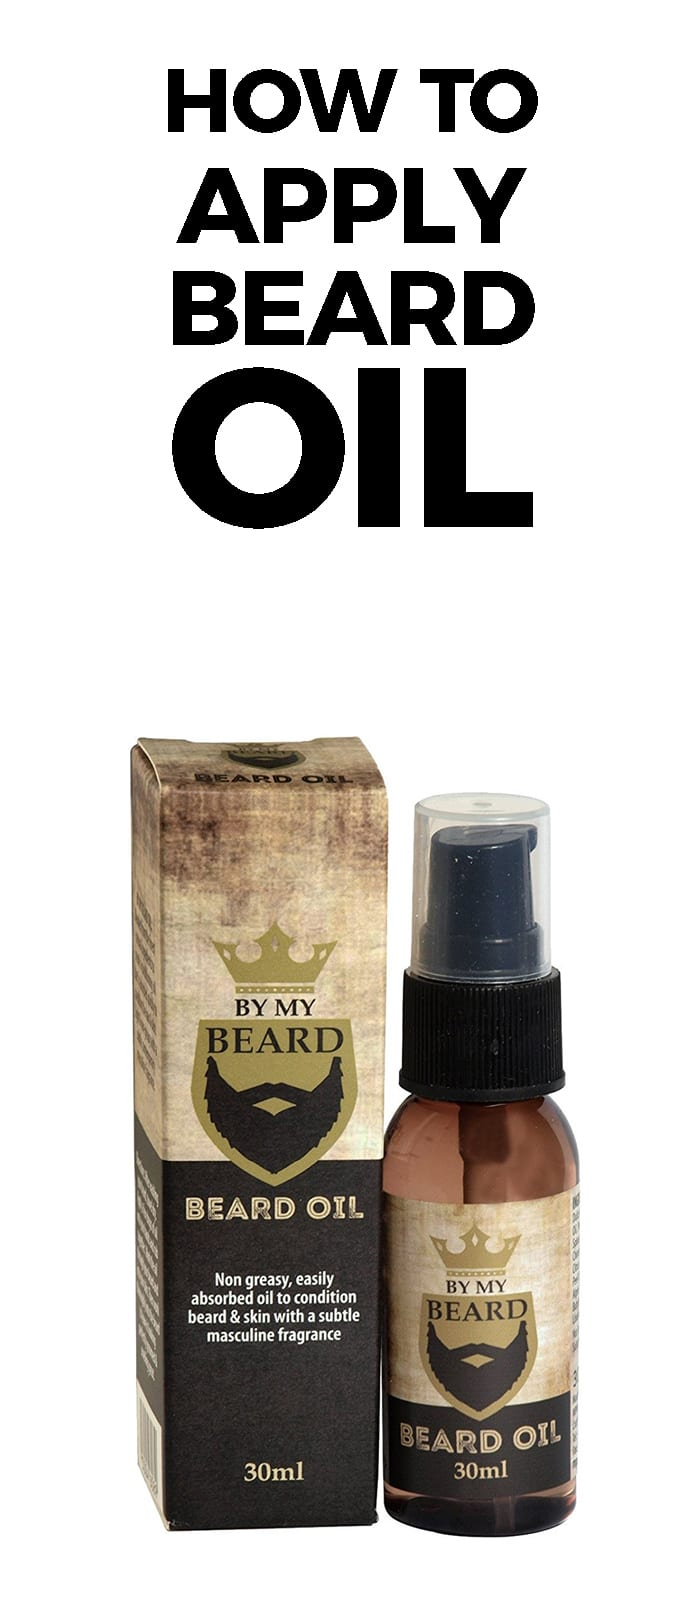 How To Apply Beard Oil.